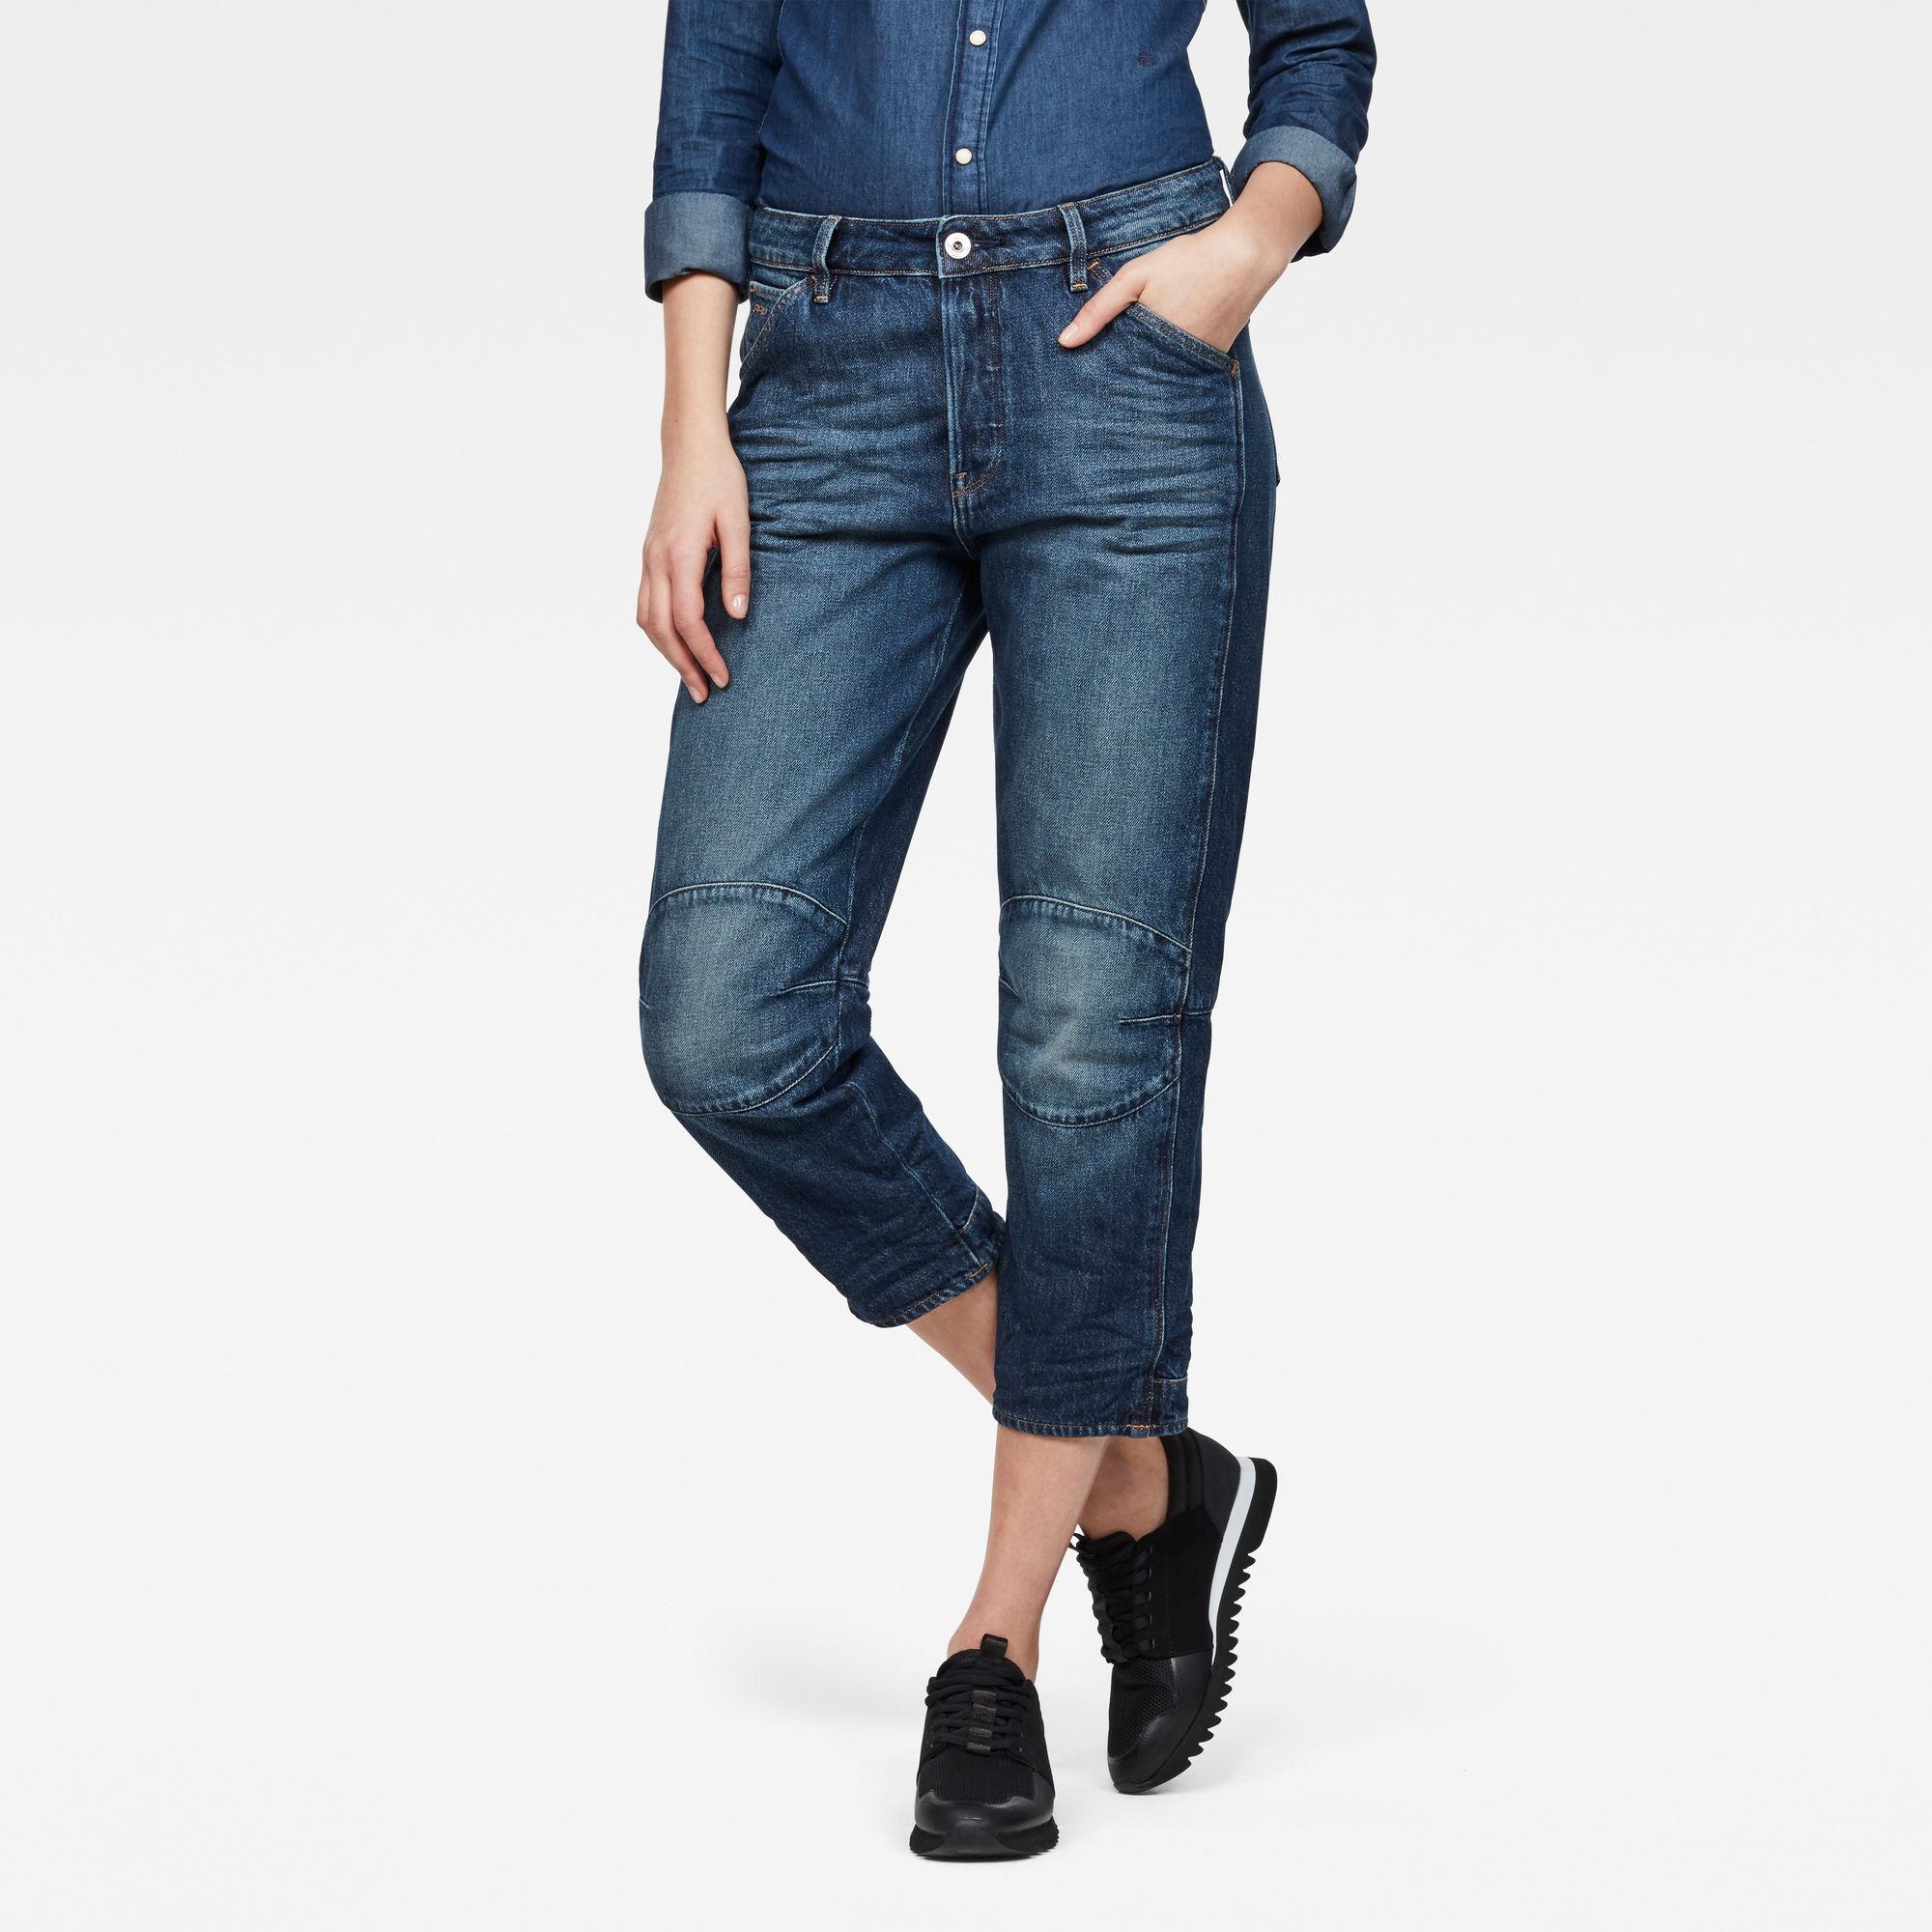 G-Star Elwood 5622 3D High waist Boyfriend 7 8-Length Jeans